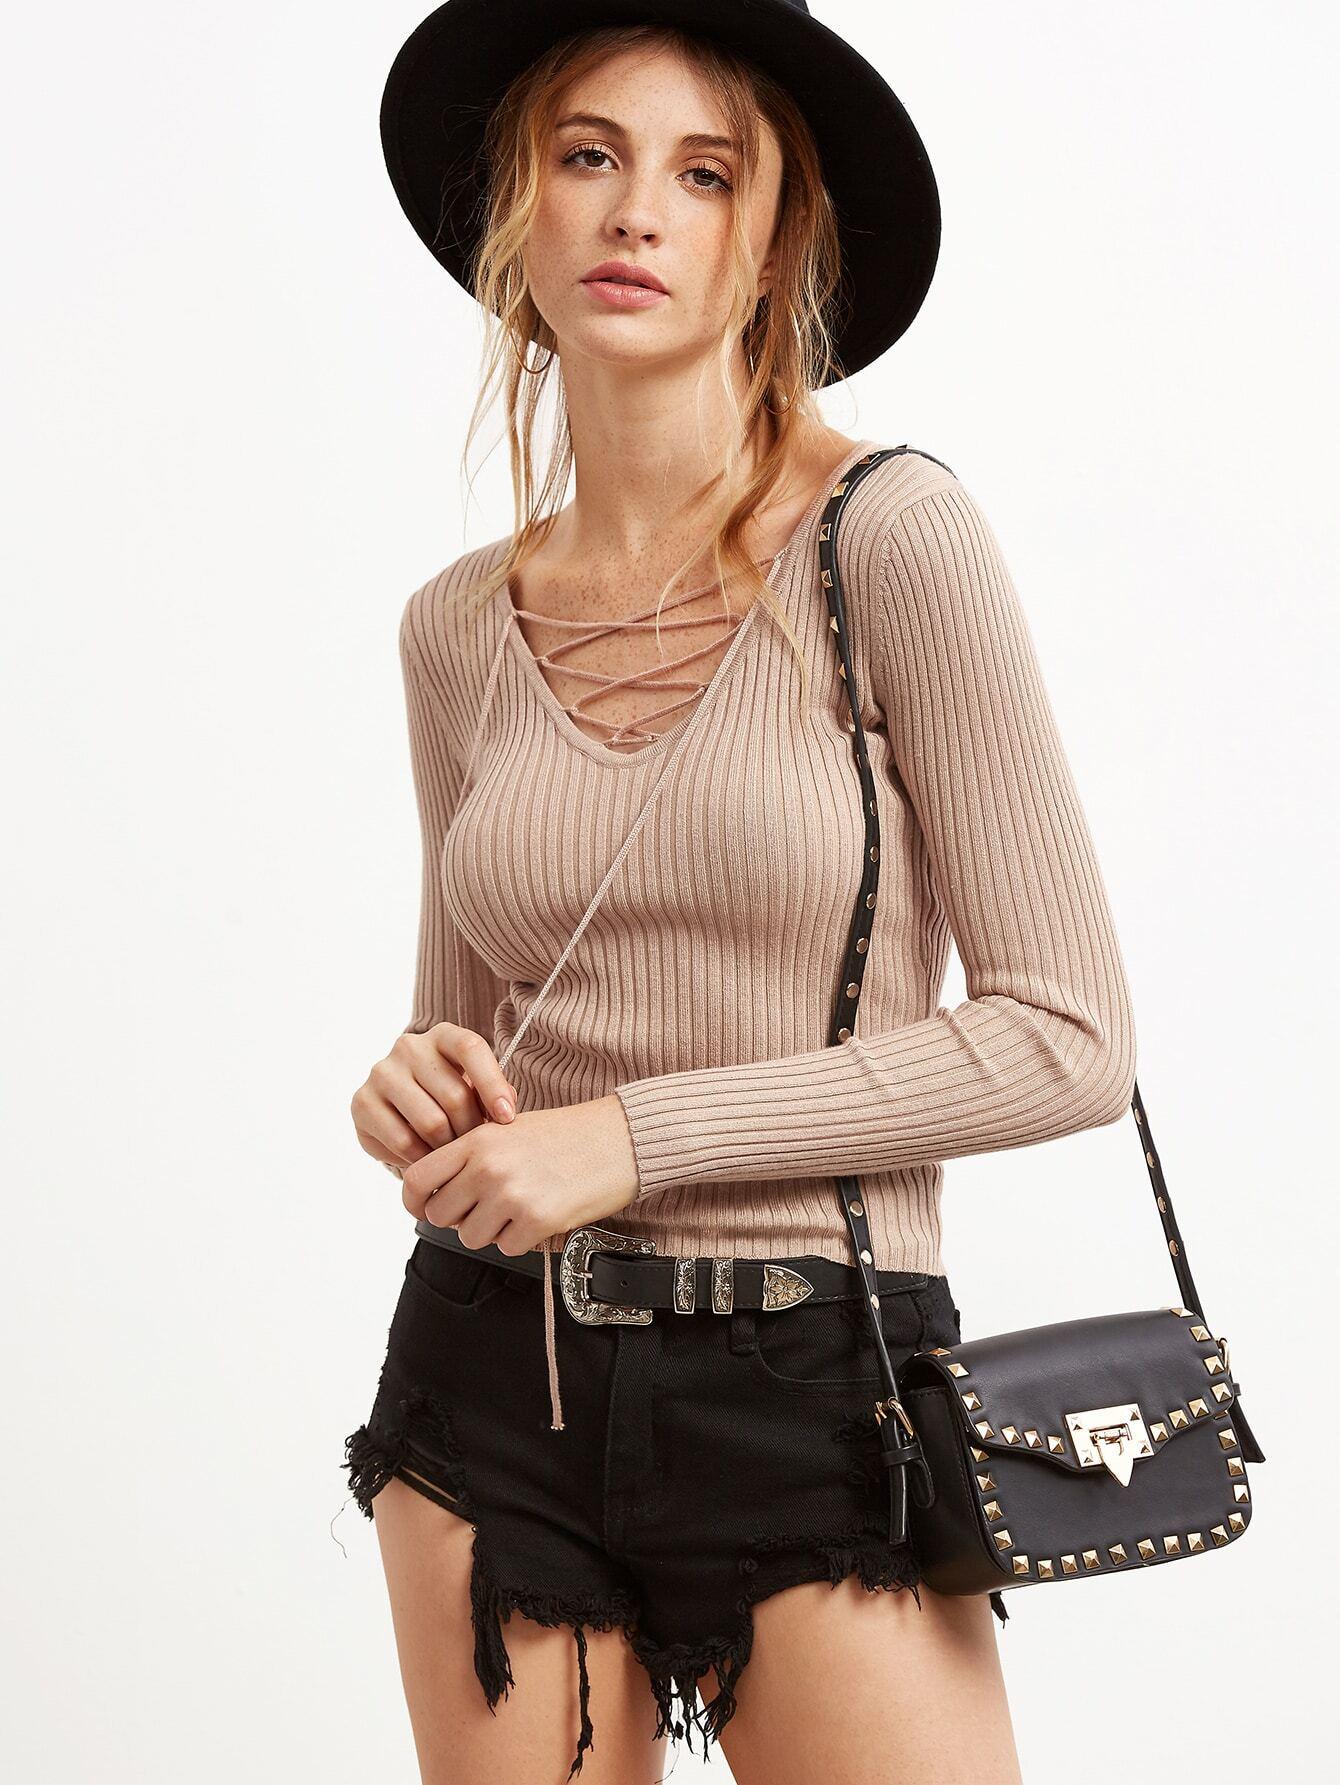 Khaki Lace Up V Neck Ribbed Slim Fit Sweater sweater160928403